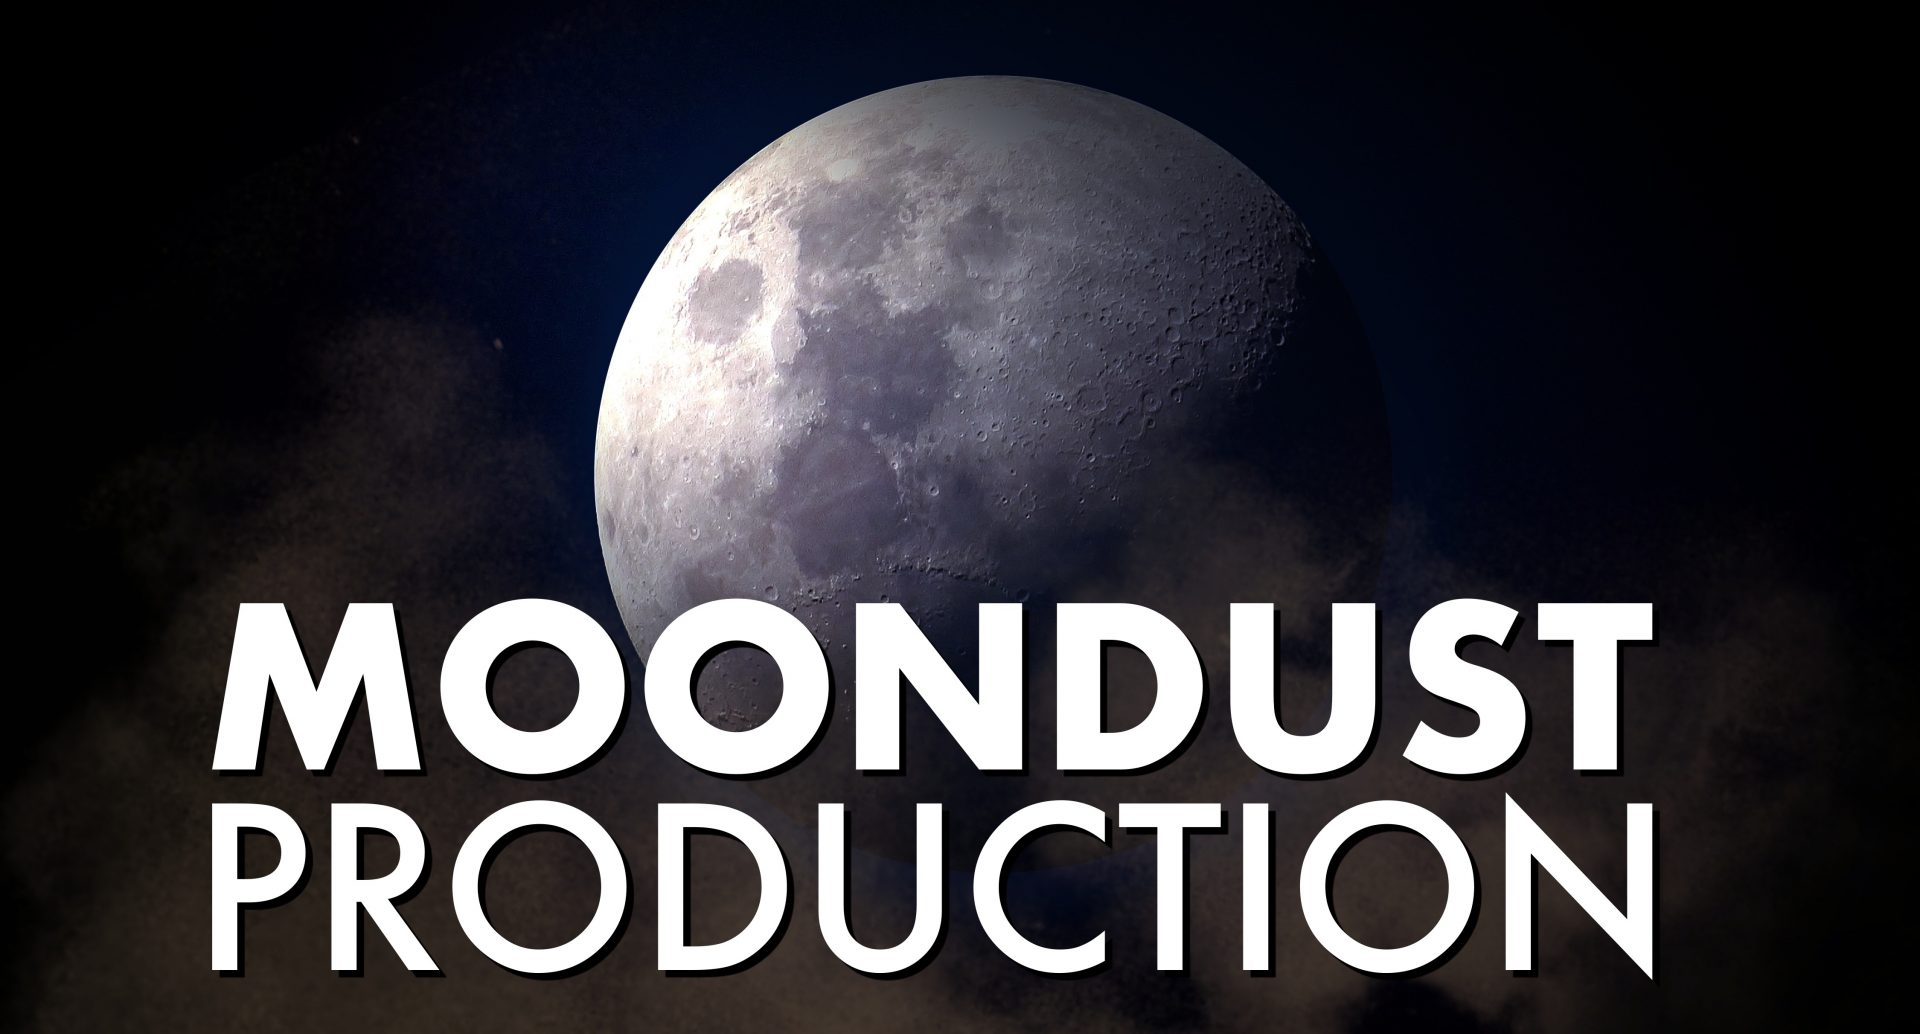 Moondust Production